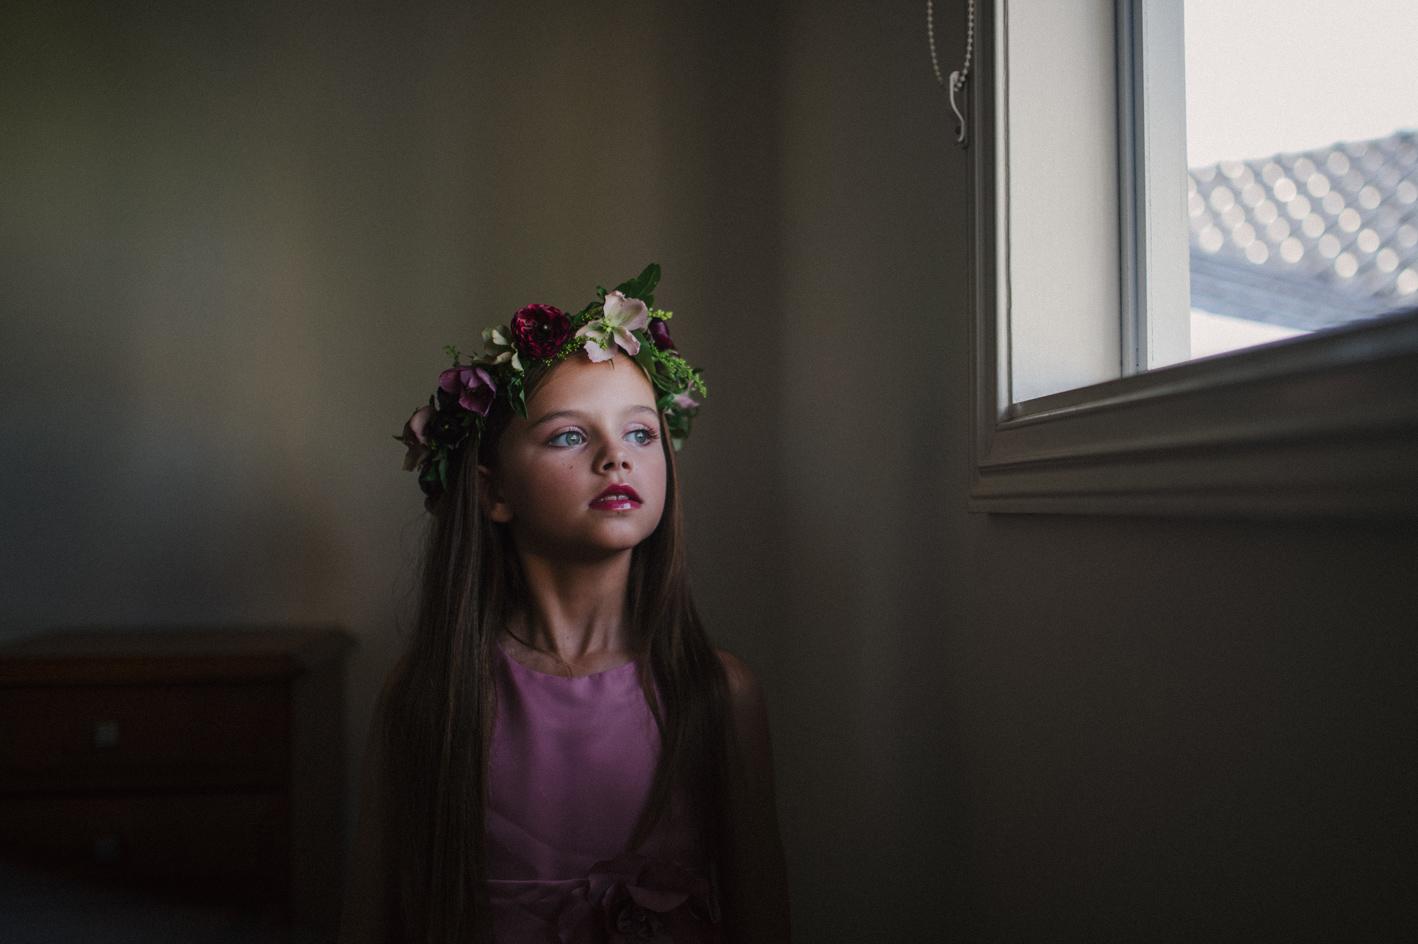 017-crown-of-eden-sophie-baker-photography